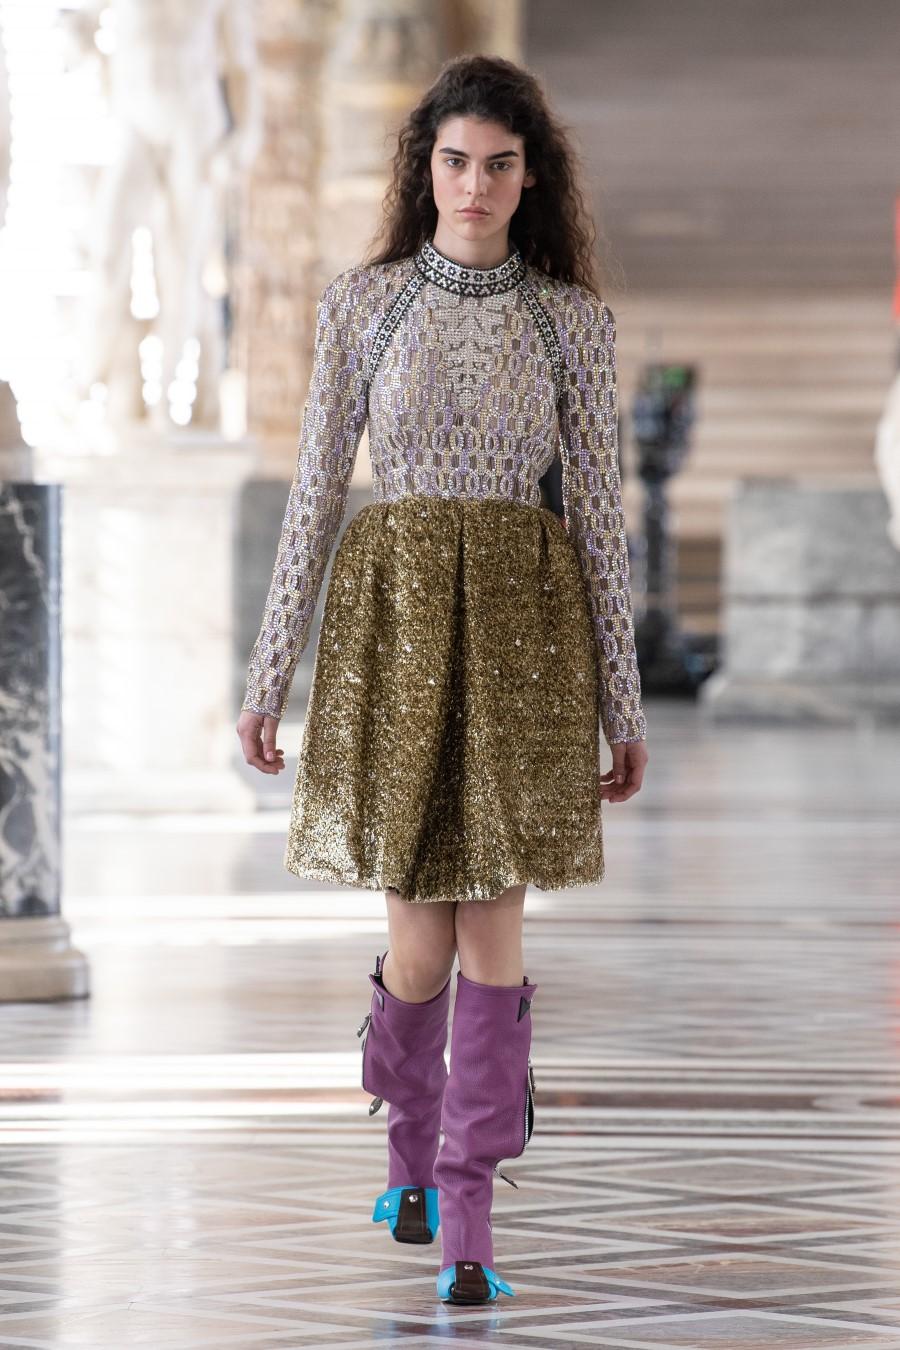 Louis Vuitton Fall Winter 2021 - Paris Fashion Week